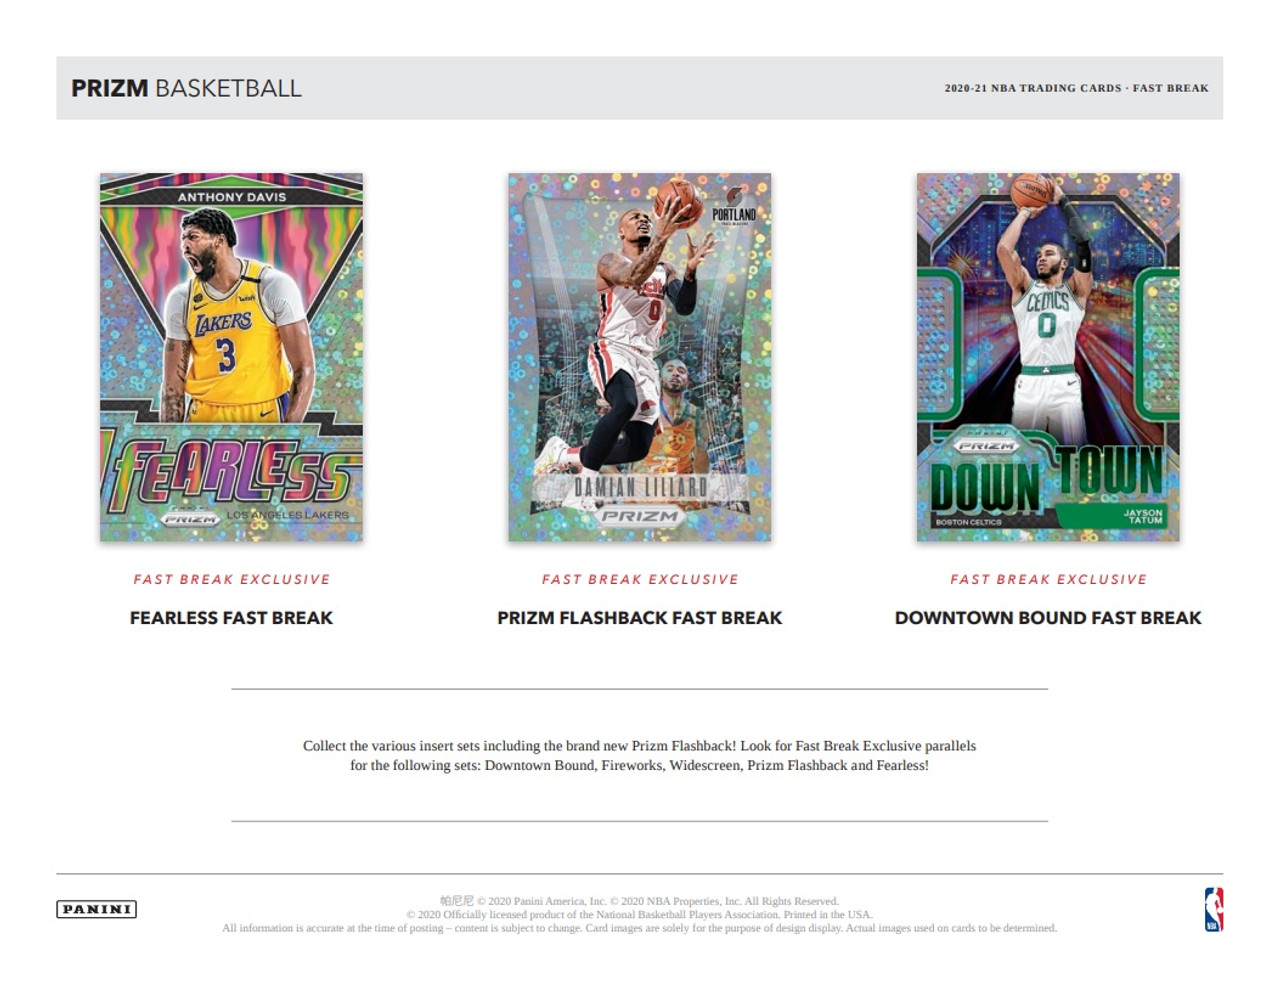 2020/21 Panini Prizm Basketball Fast Break Box